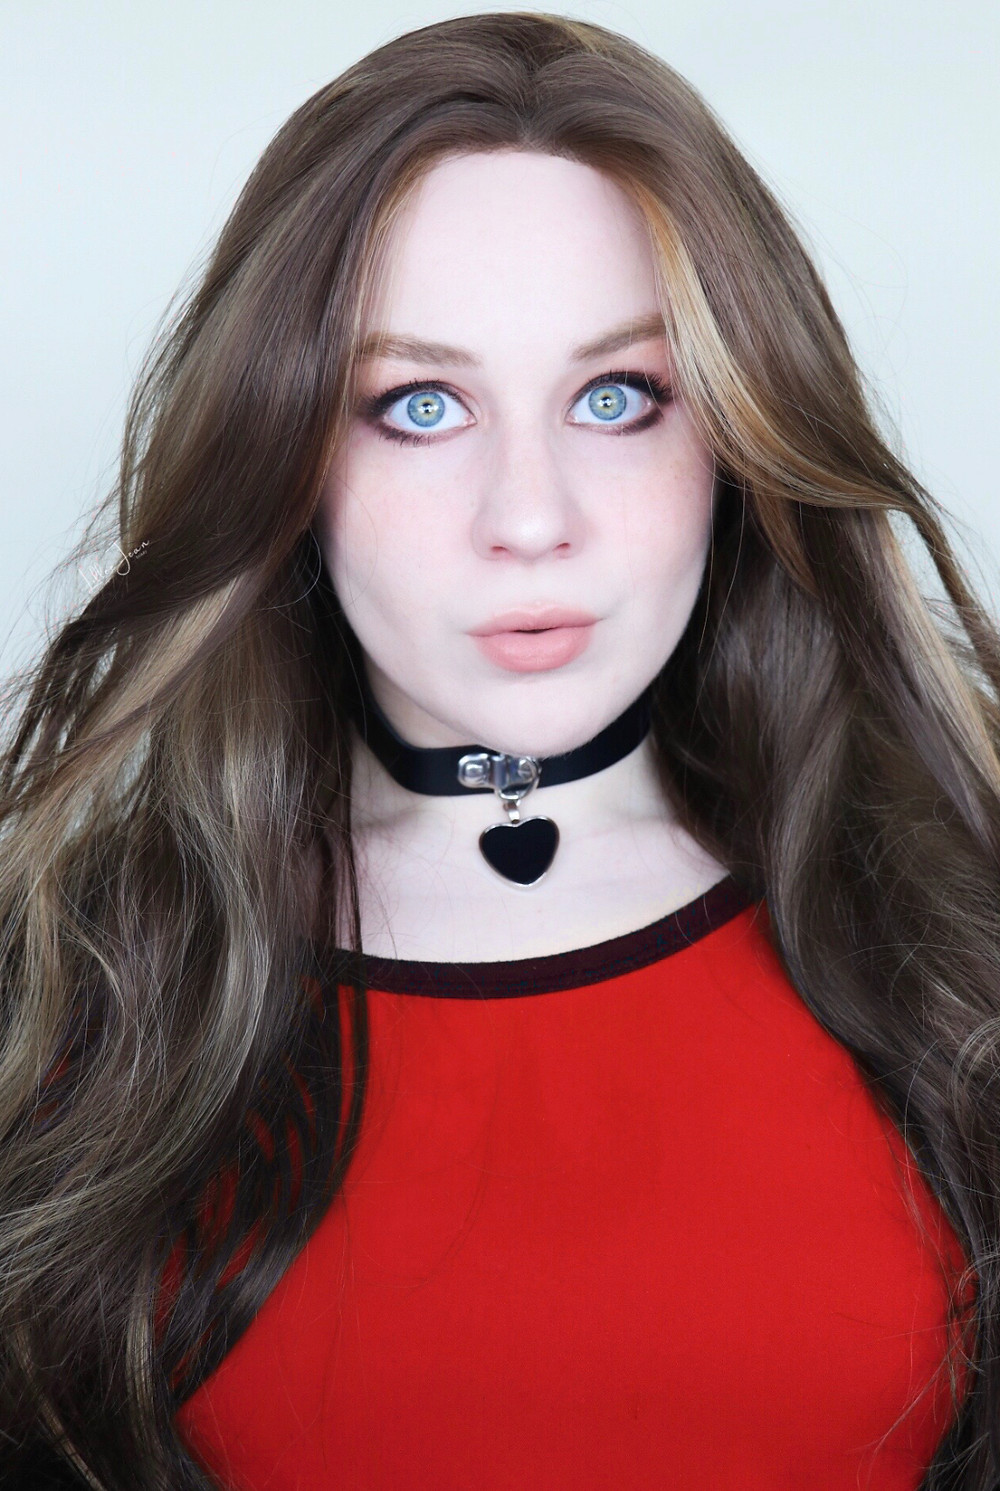 Disney's Freaky Friday Makeup | Lindsay Lohan Inspired Tutorial 2021 | Lillee Jean